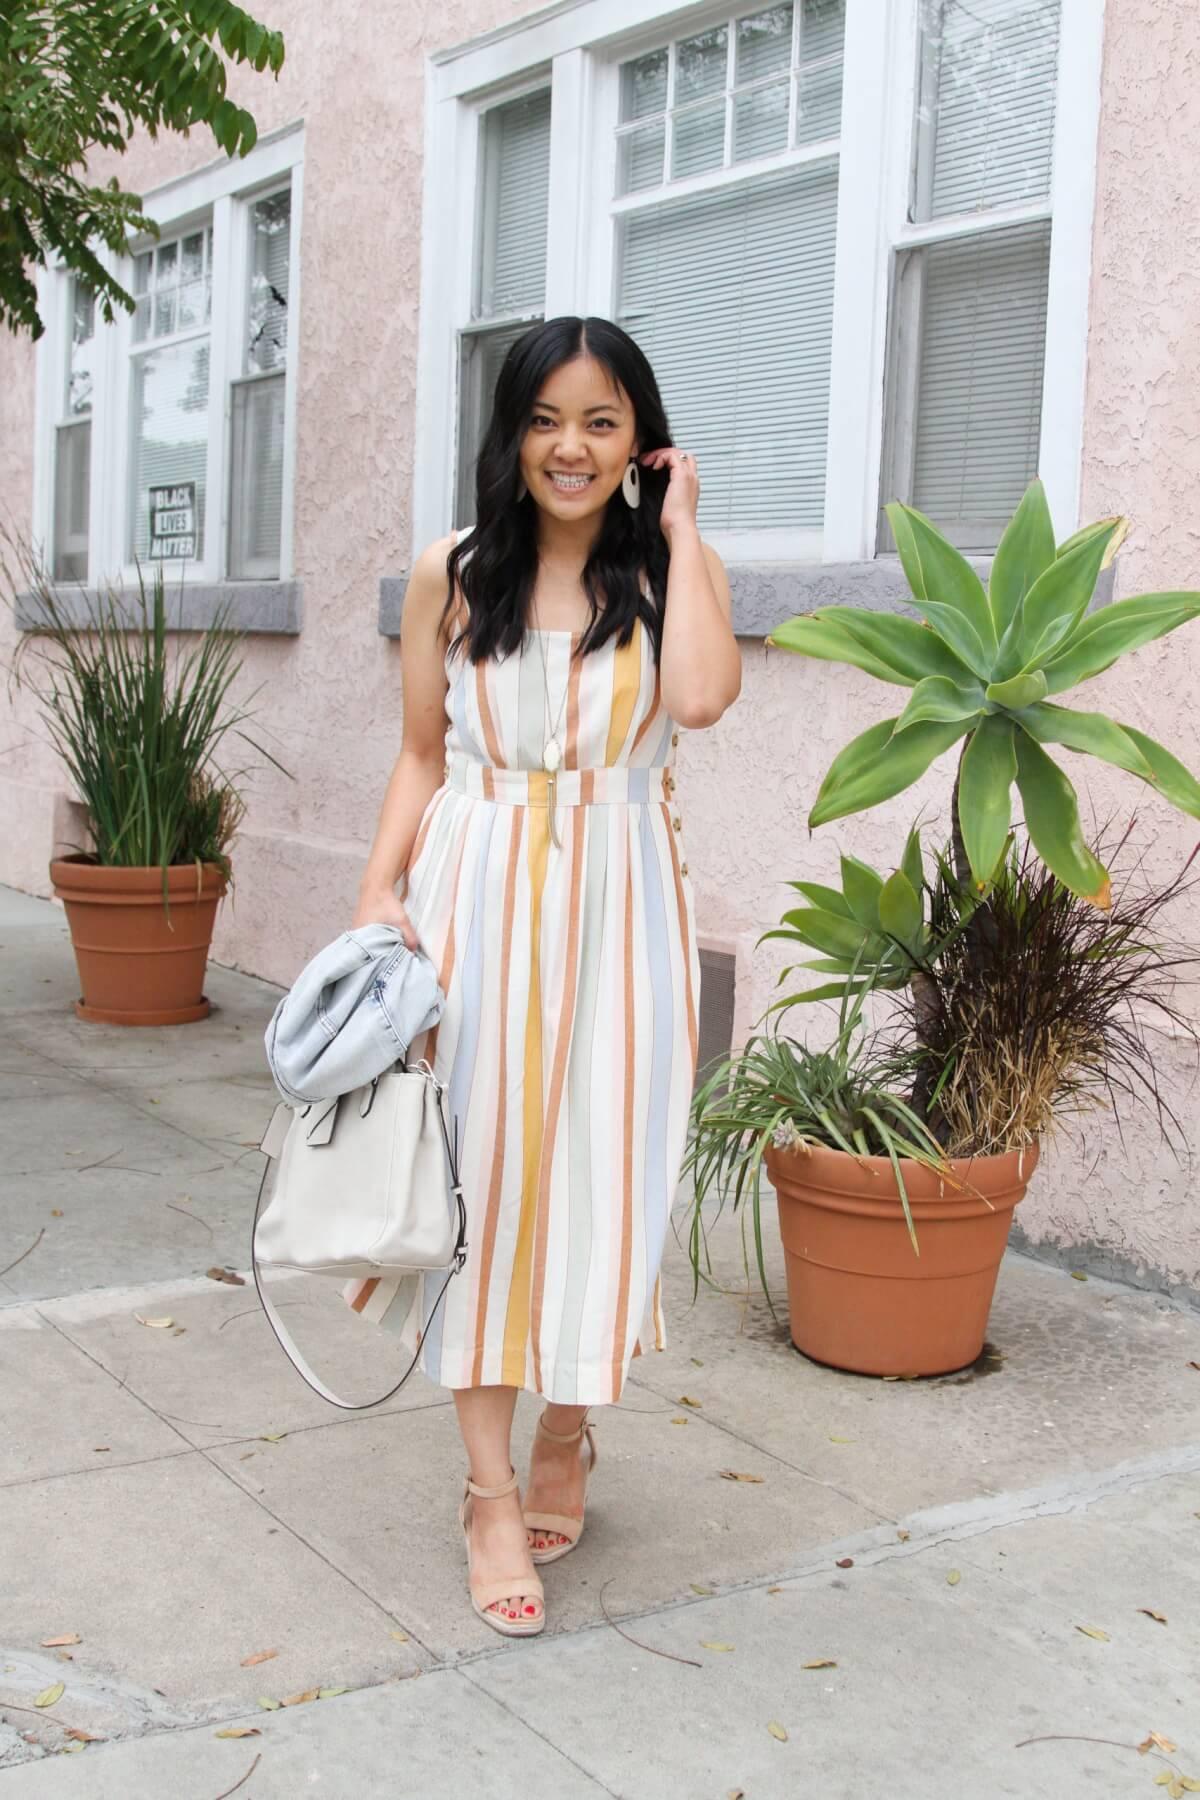 Dressy Outfit: pastel striped midi sleeveless dress + nude wedges + pendant necklace + white earrings + denim jacket + white bag